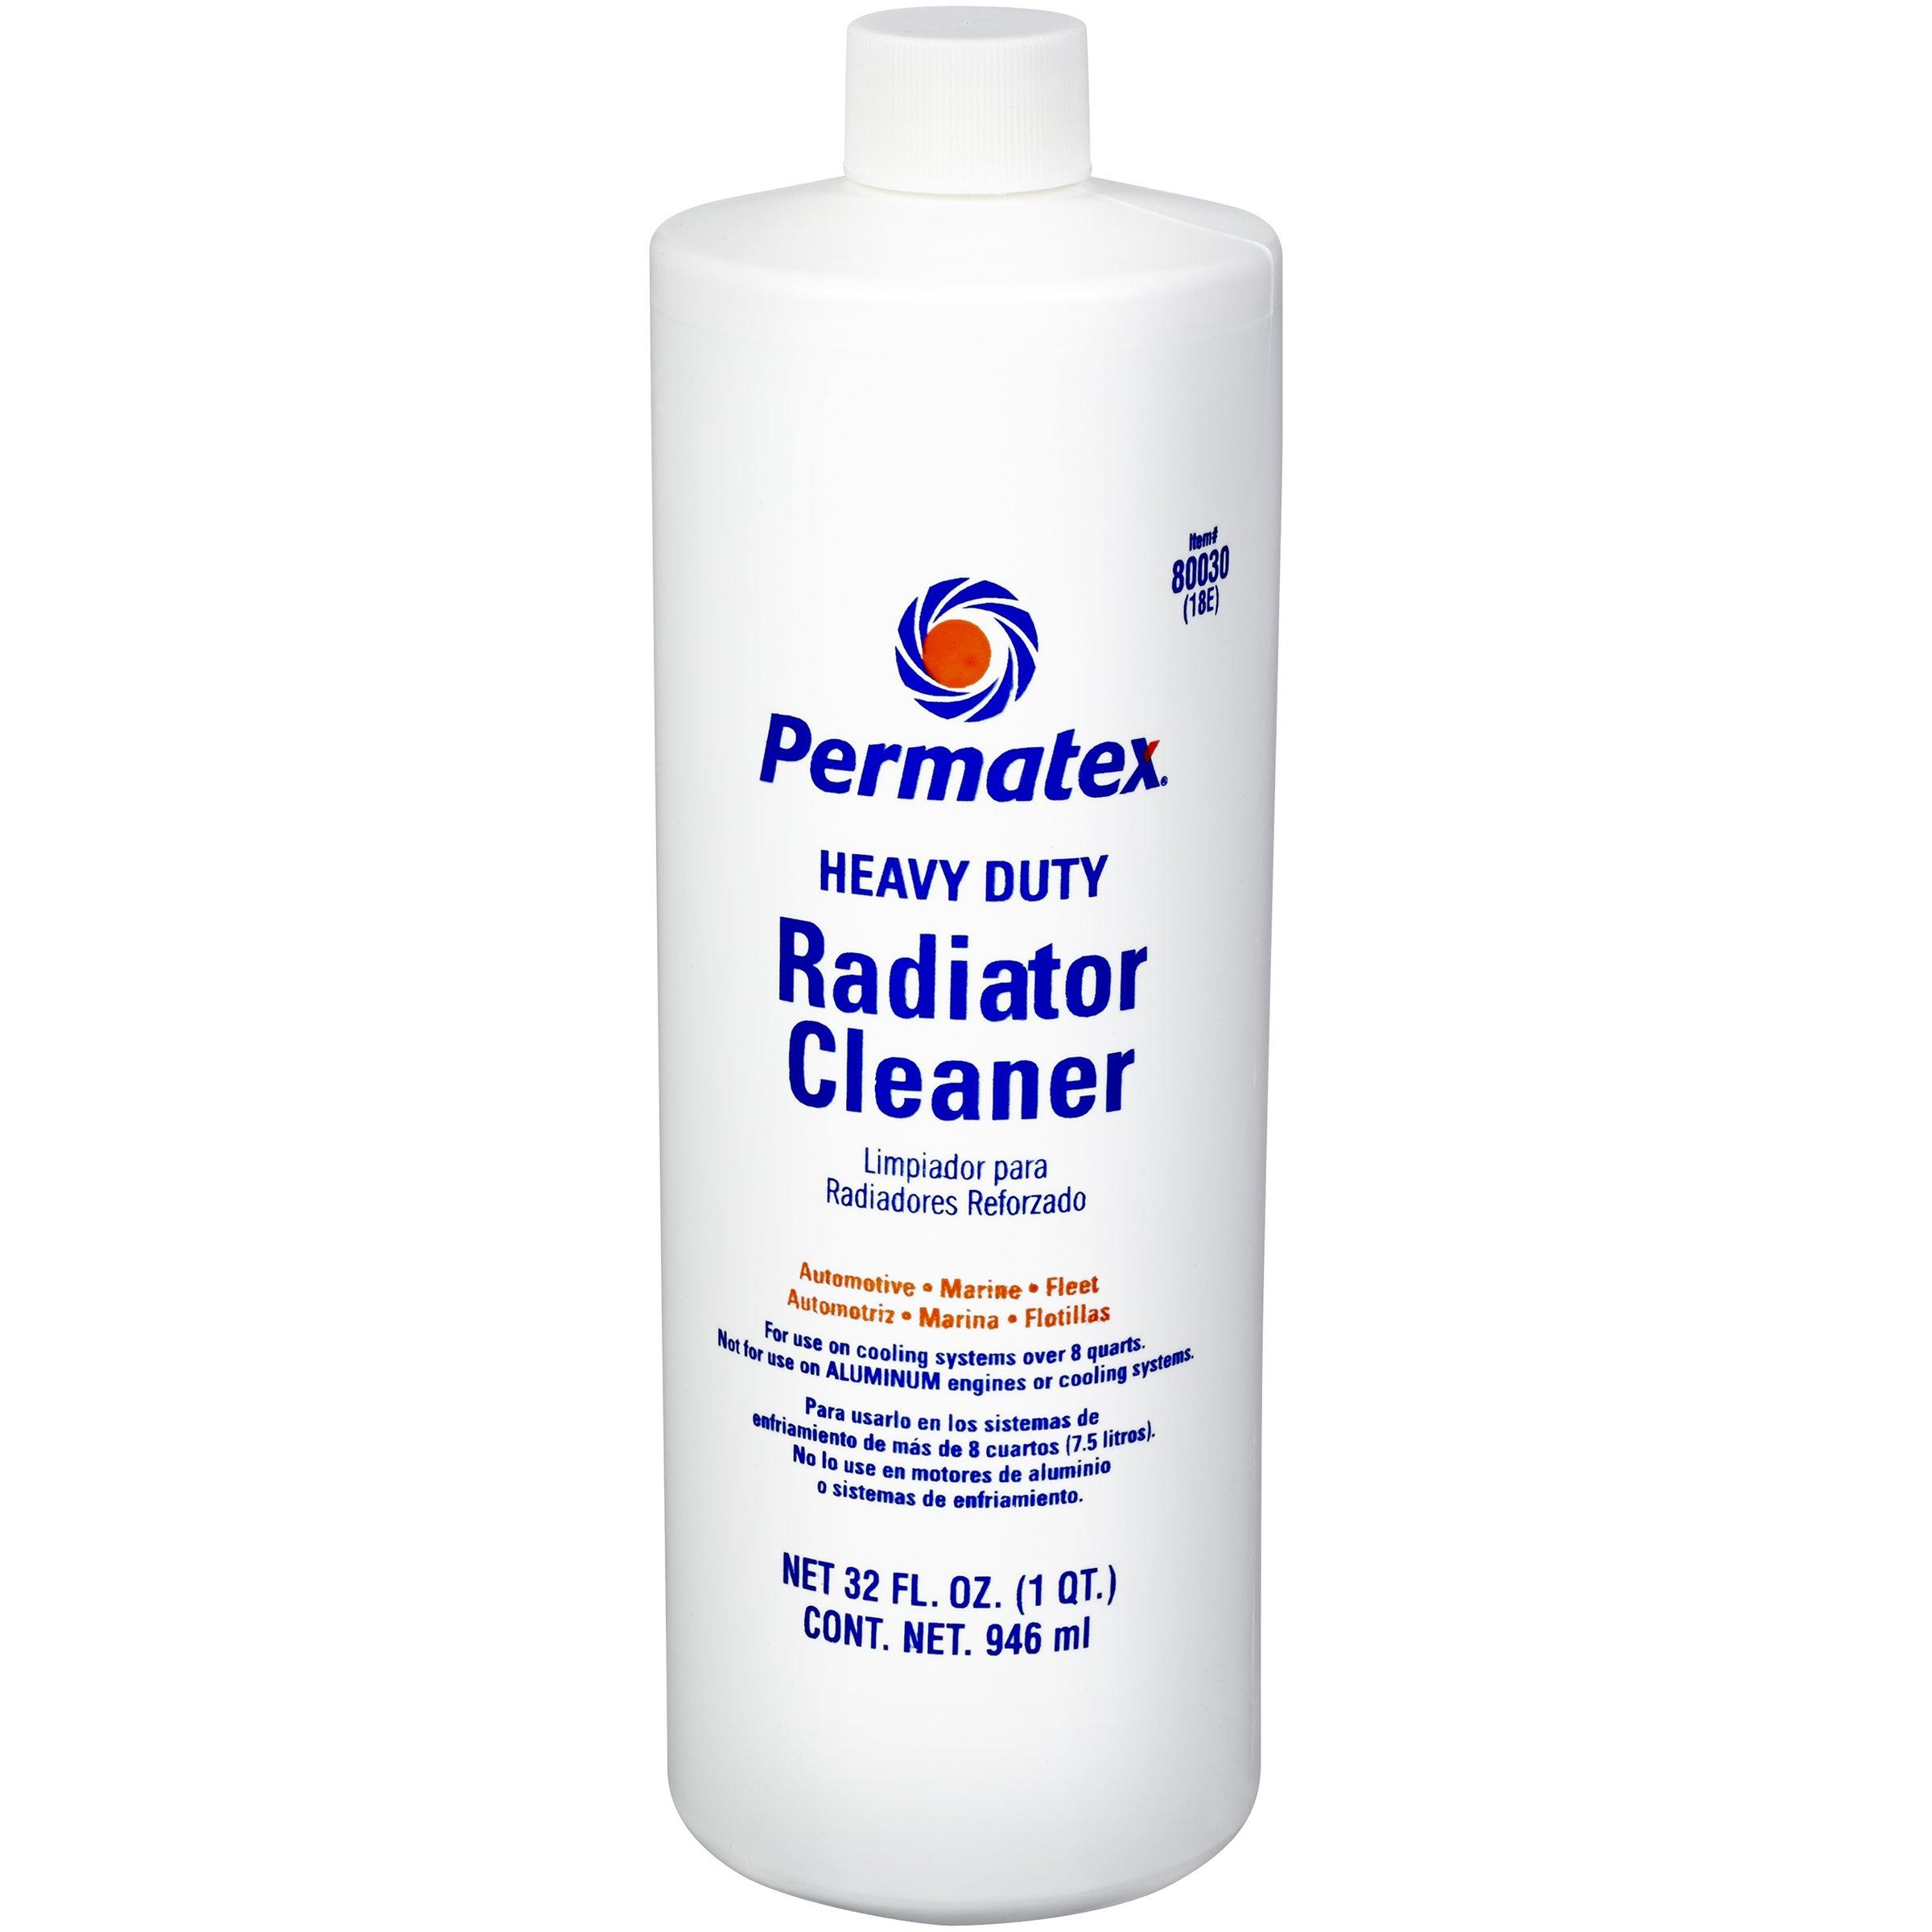 Permatex 80030 Heavy Duty Radiator Cleaner, 1 quart by Permatex